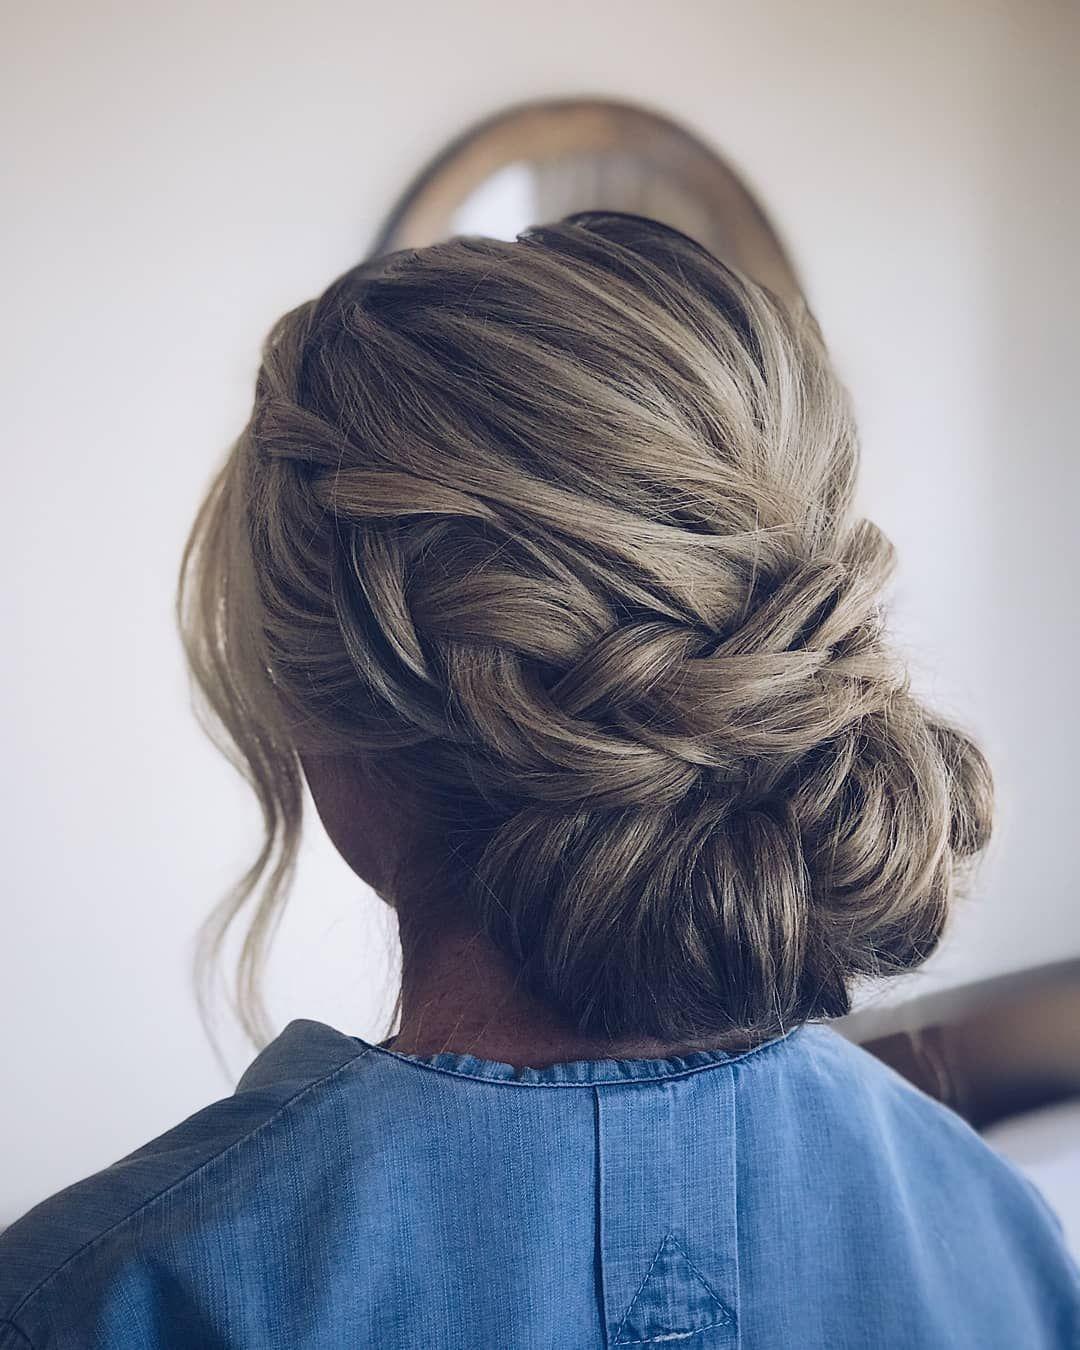 34 Beautiful Wedding Hairstyle Inspiration Bridal Updo Textured